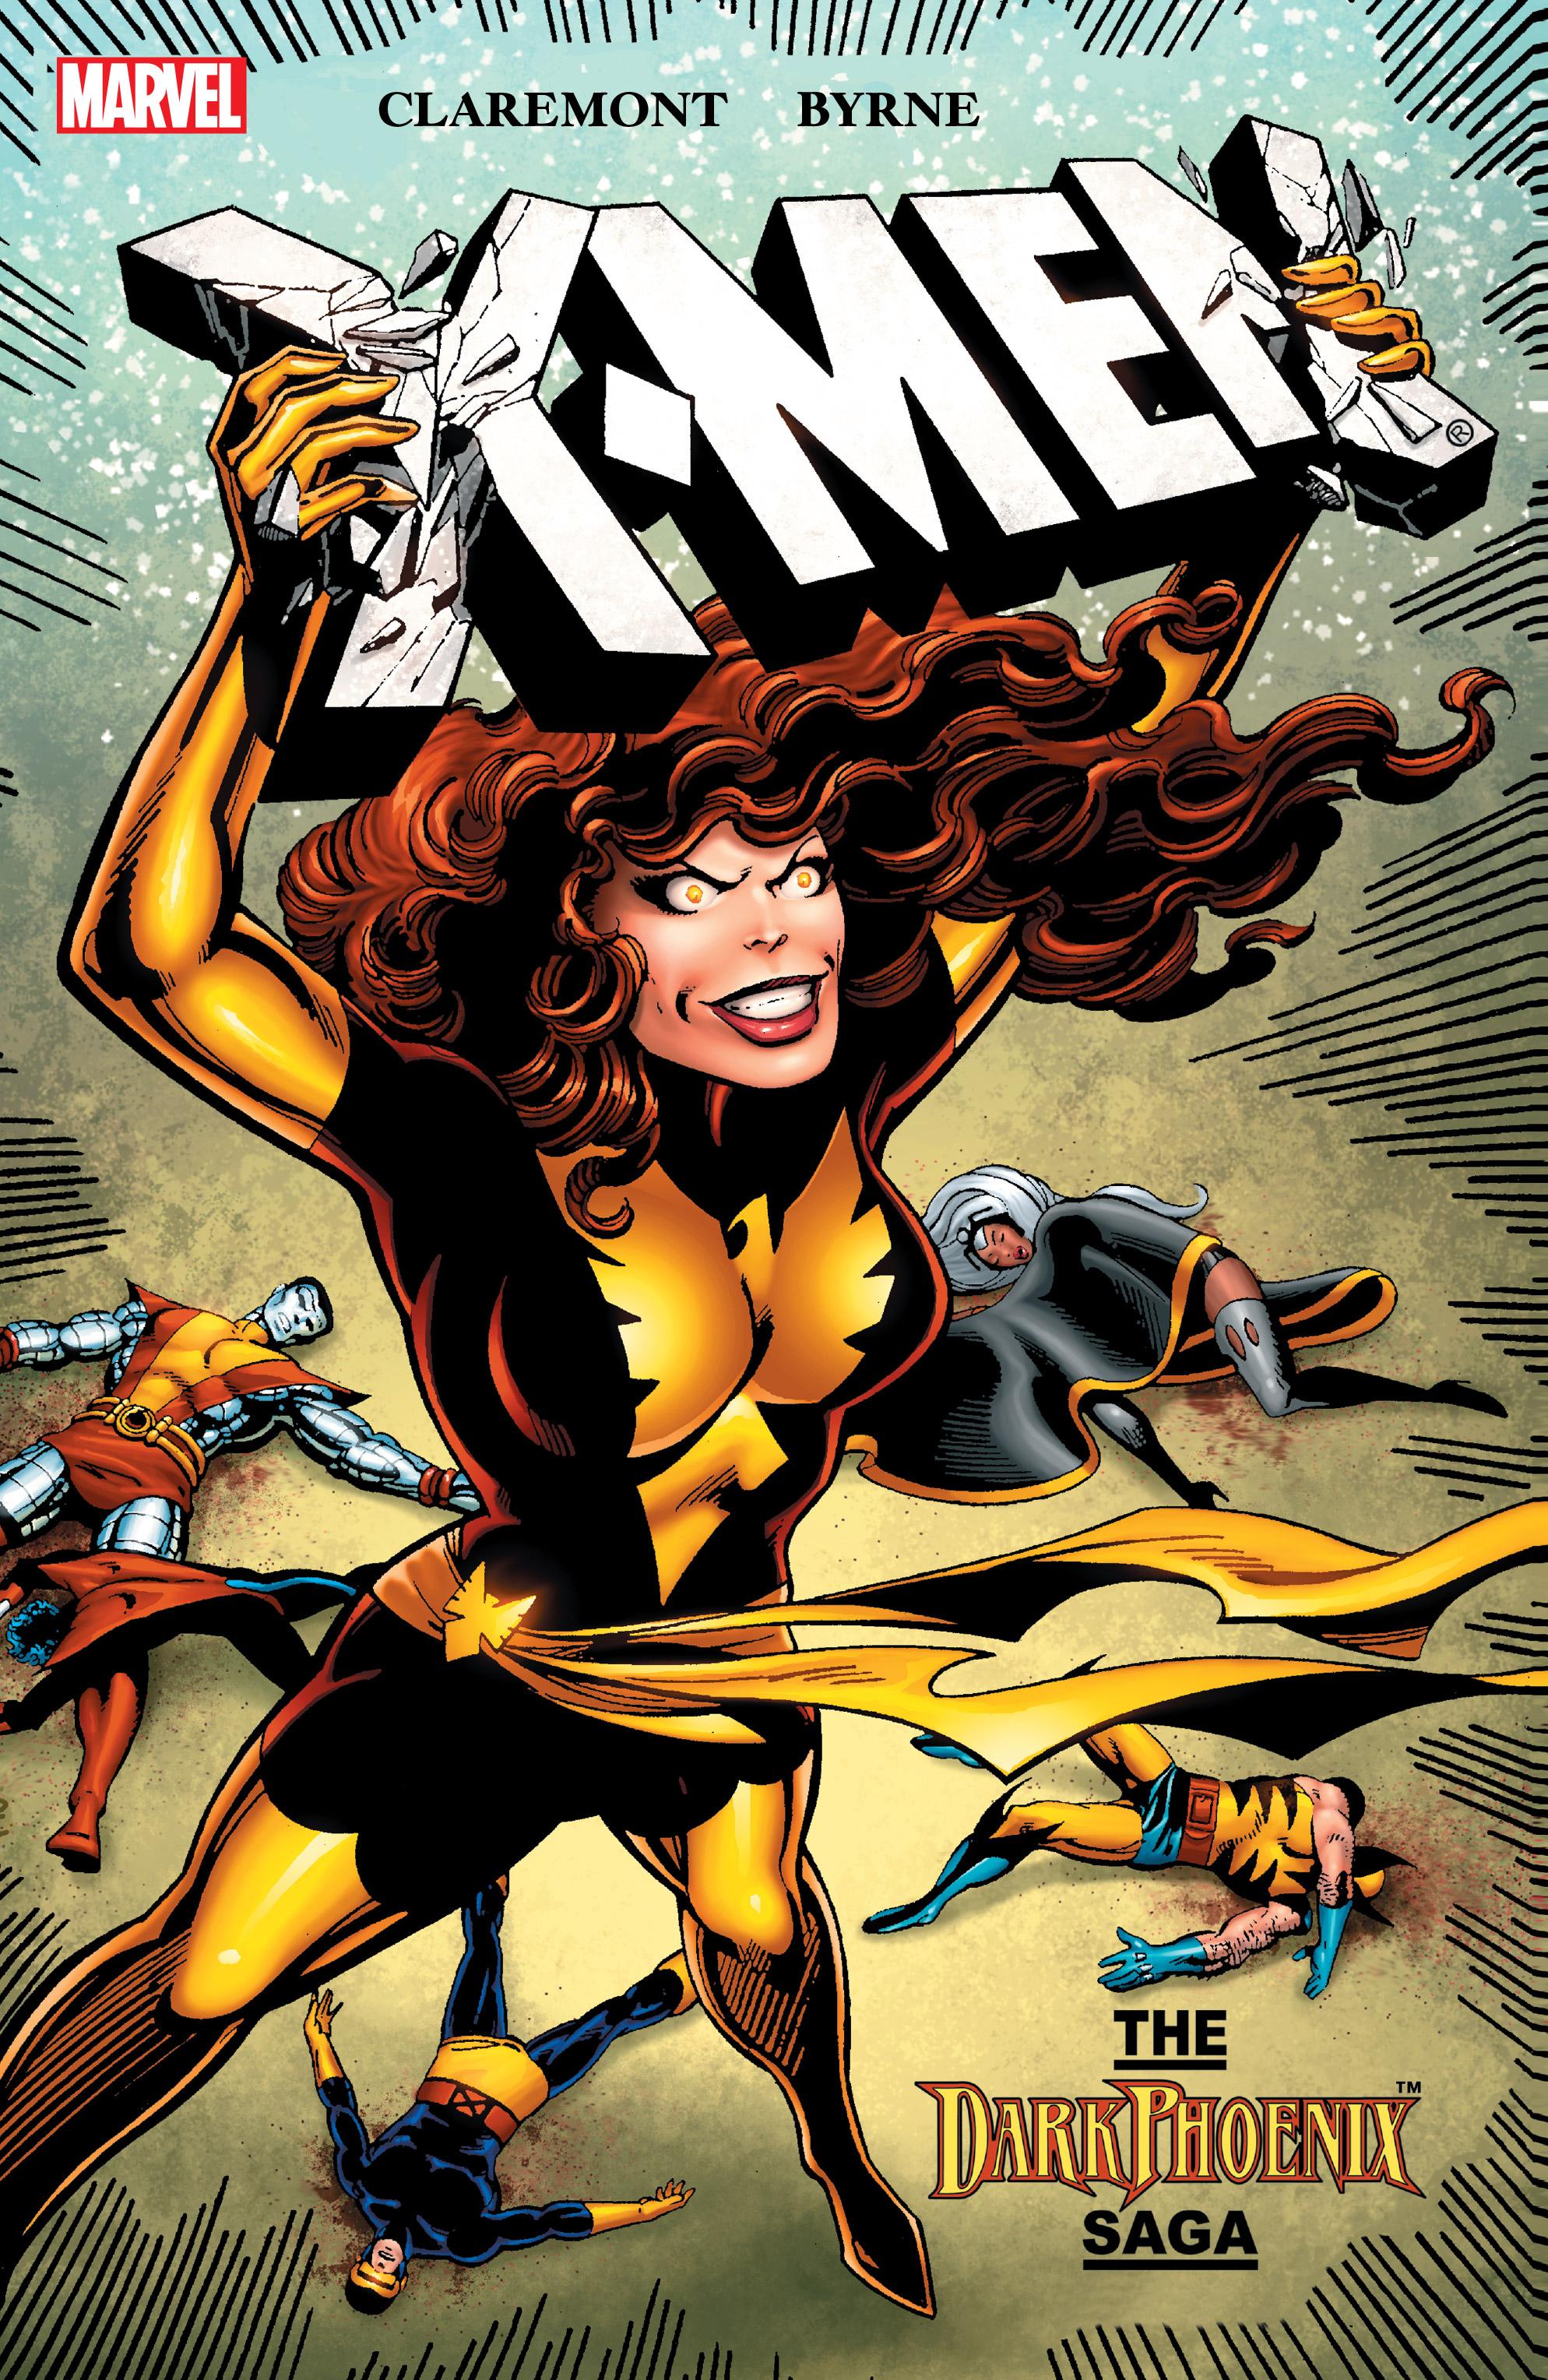 X-Men: The Dark Phoenix Saga  (Marvel, 2006), trade dress